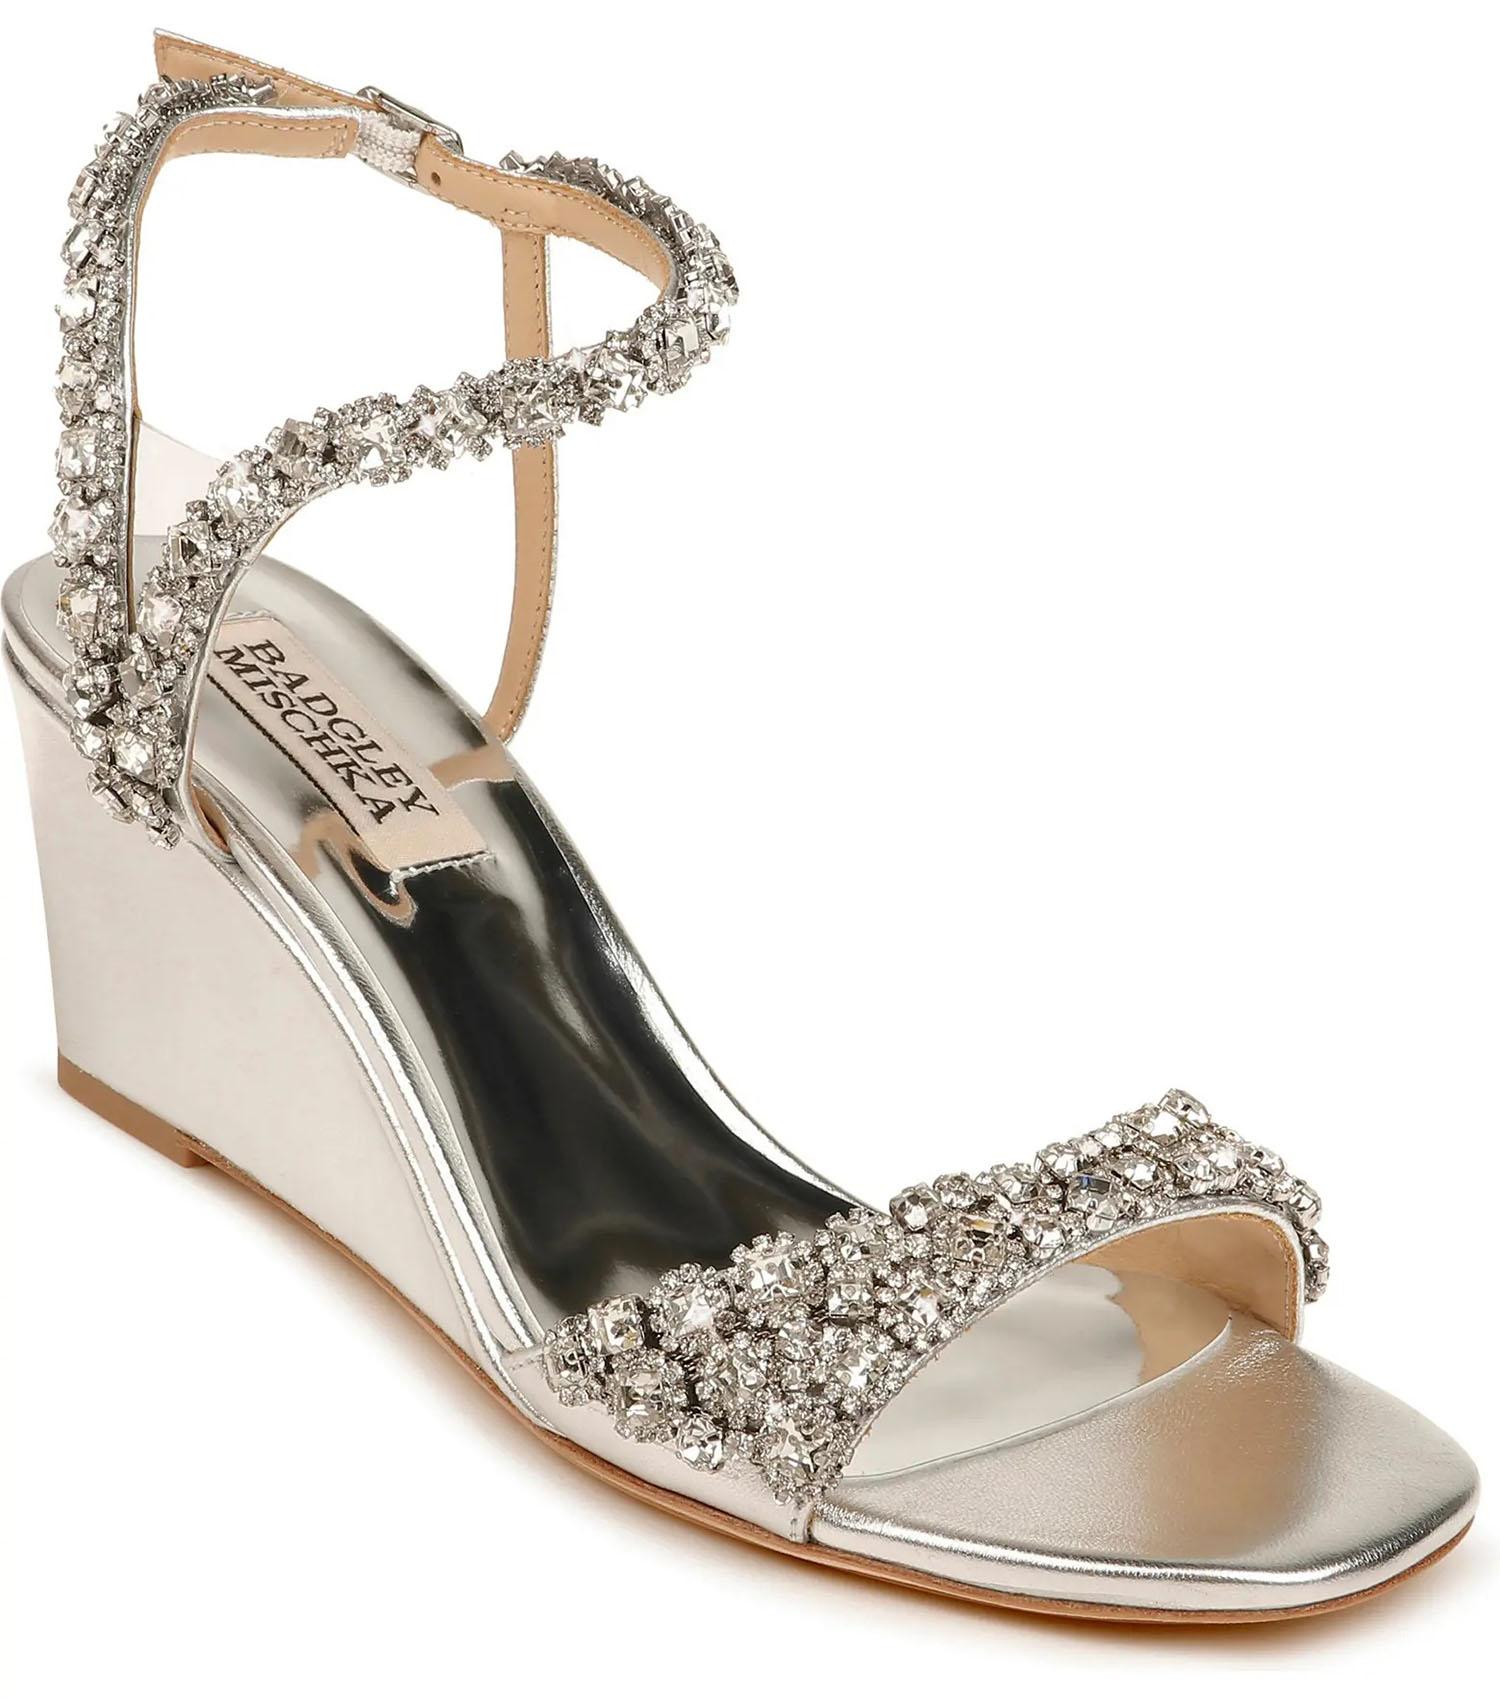 Badgley Mischka crystal embellished wedge heel at Nordstrom Rack